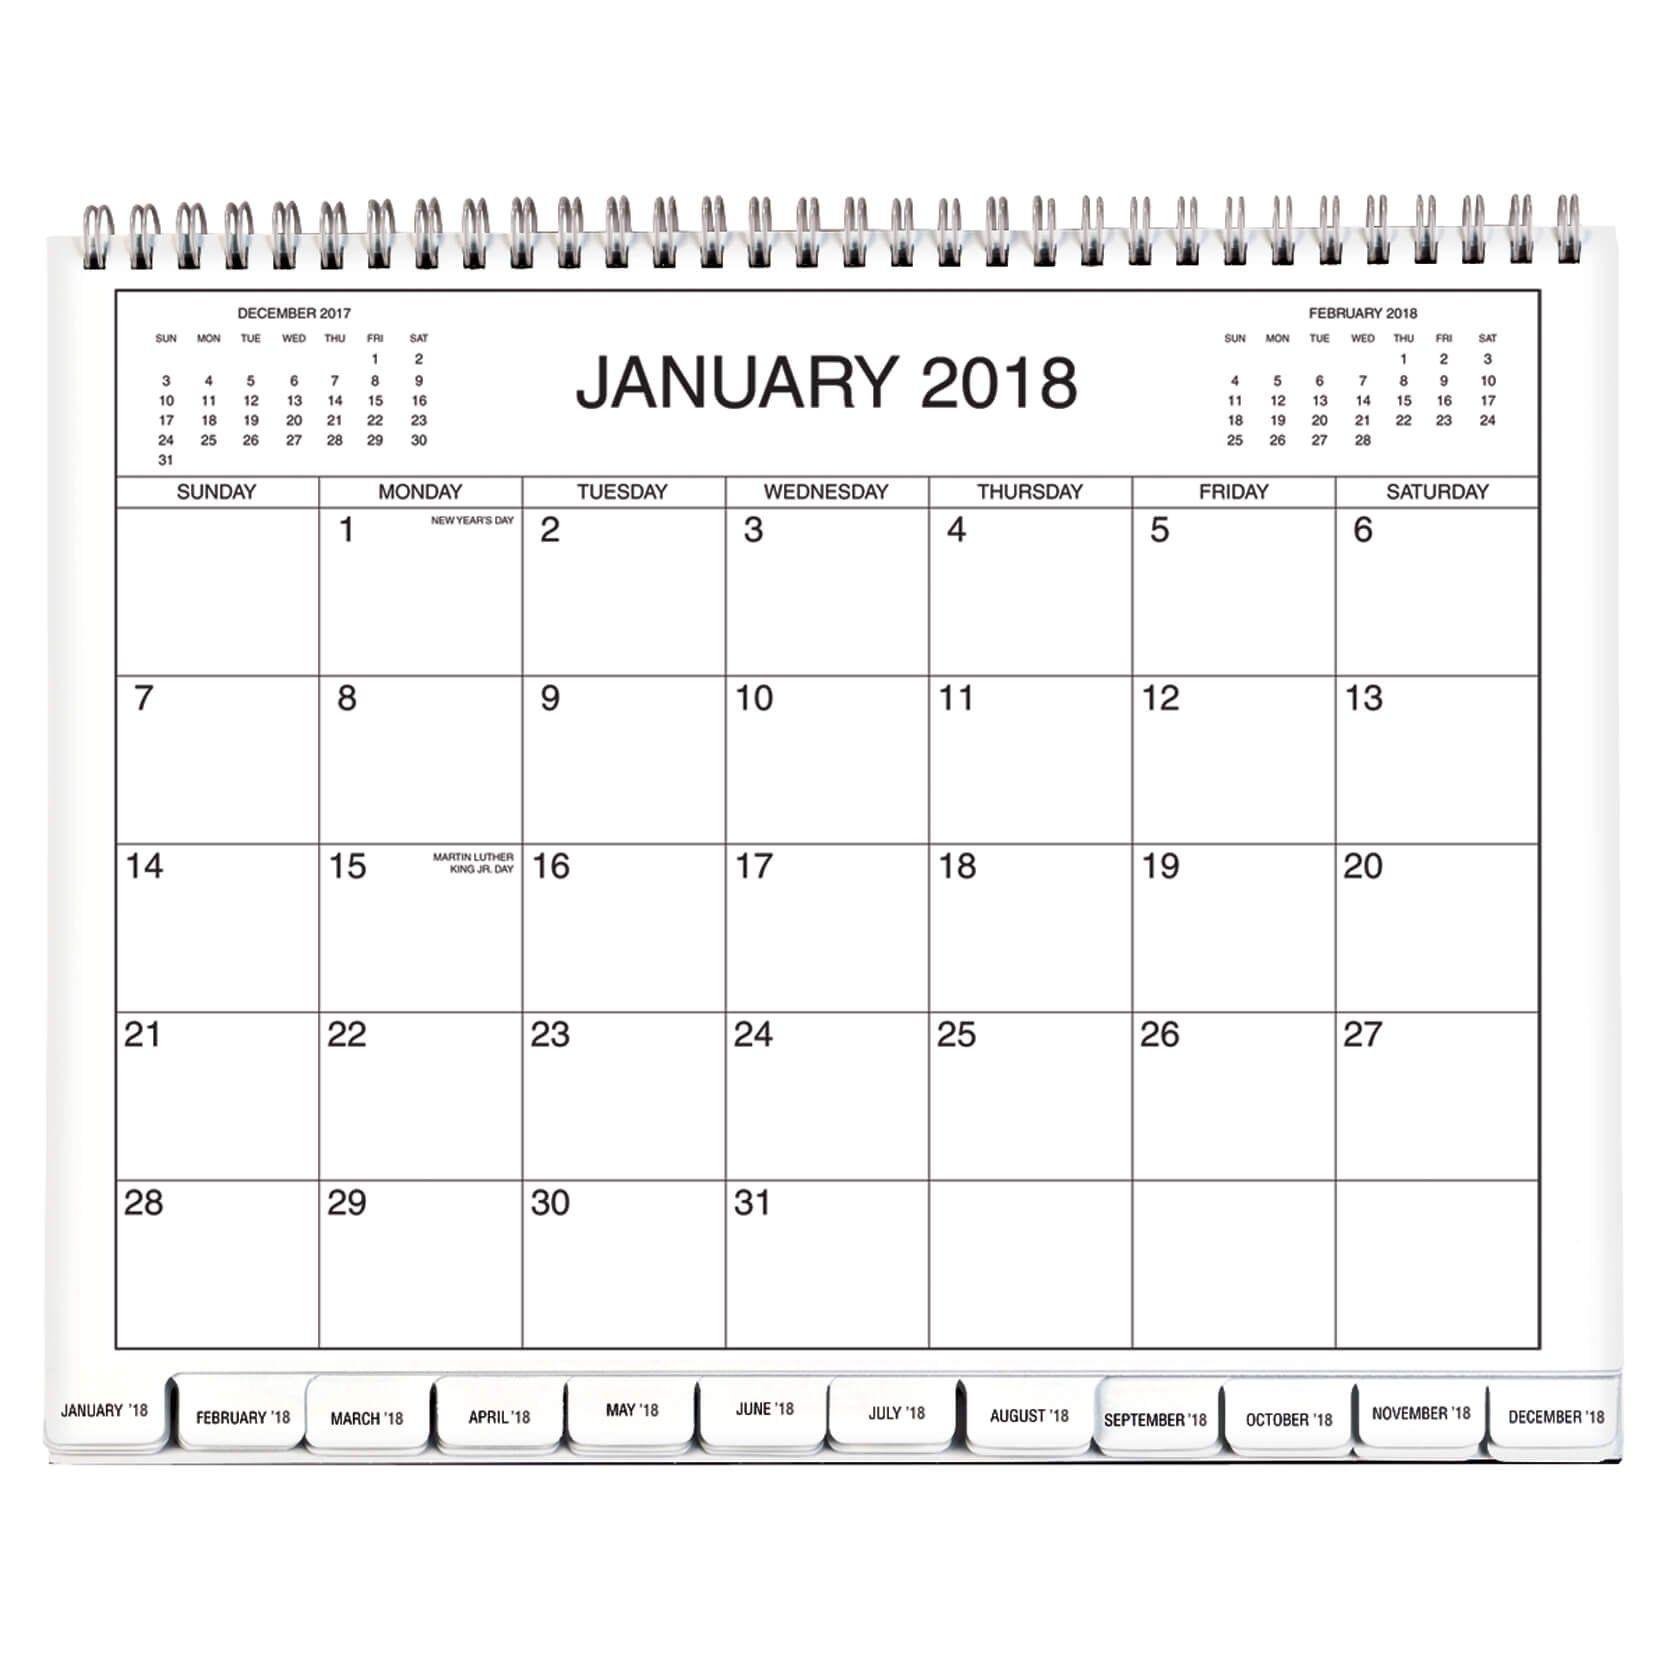 5 year calendar 2019 to 2023 : free calendar template